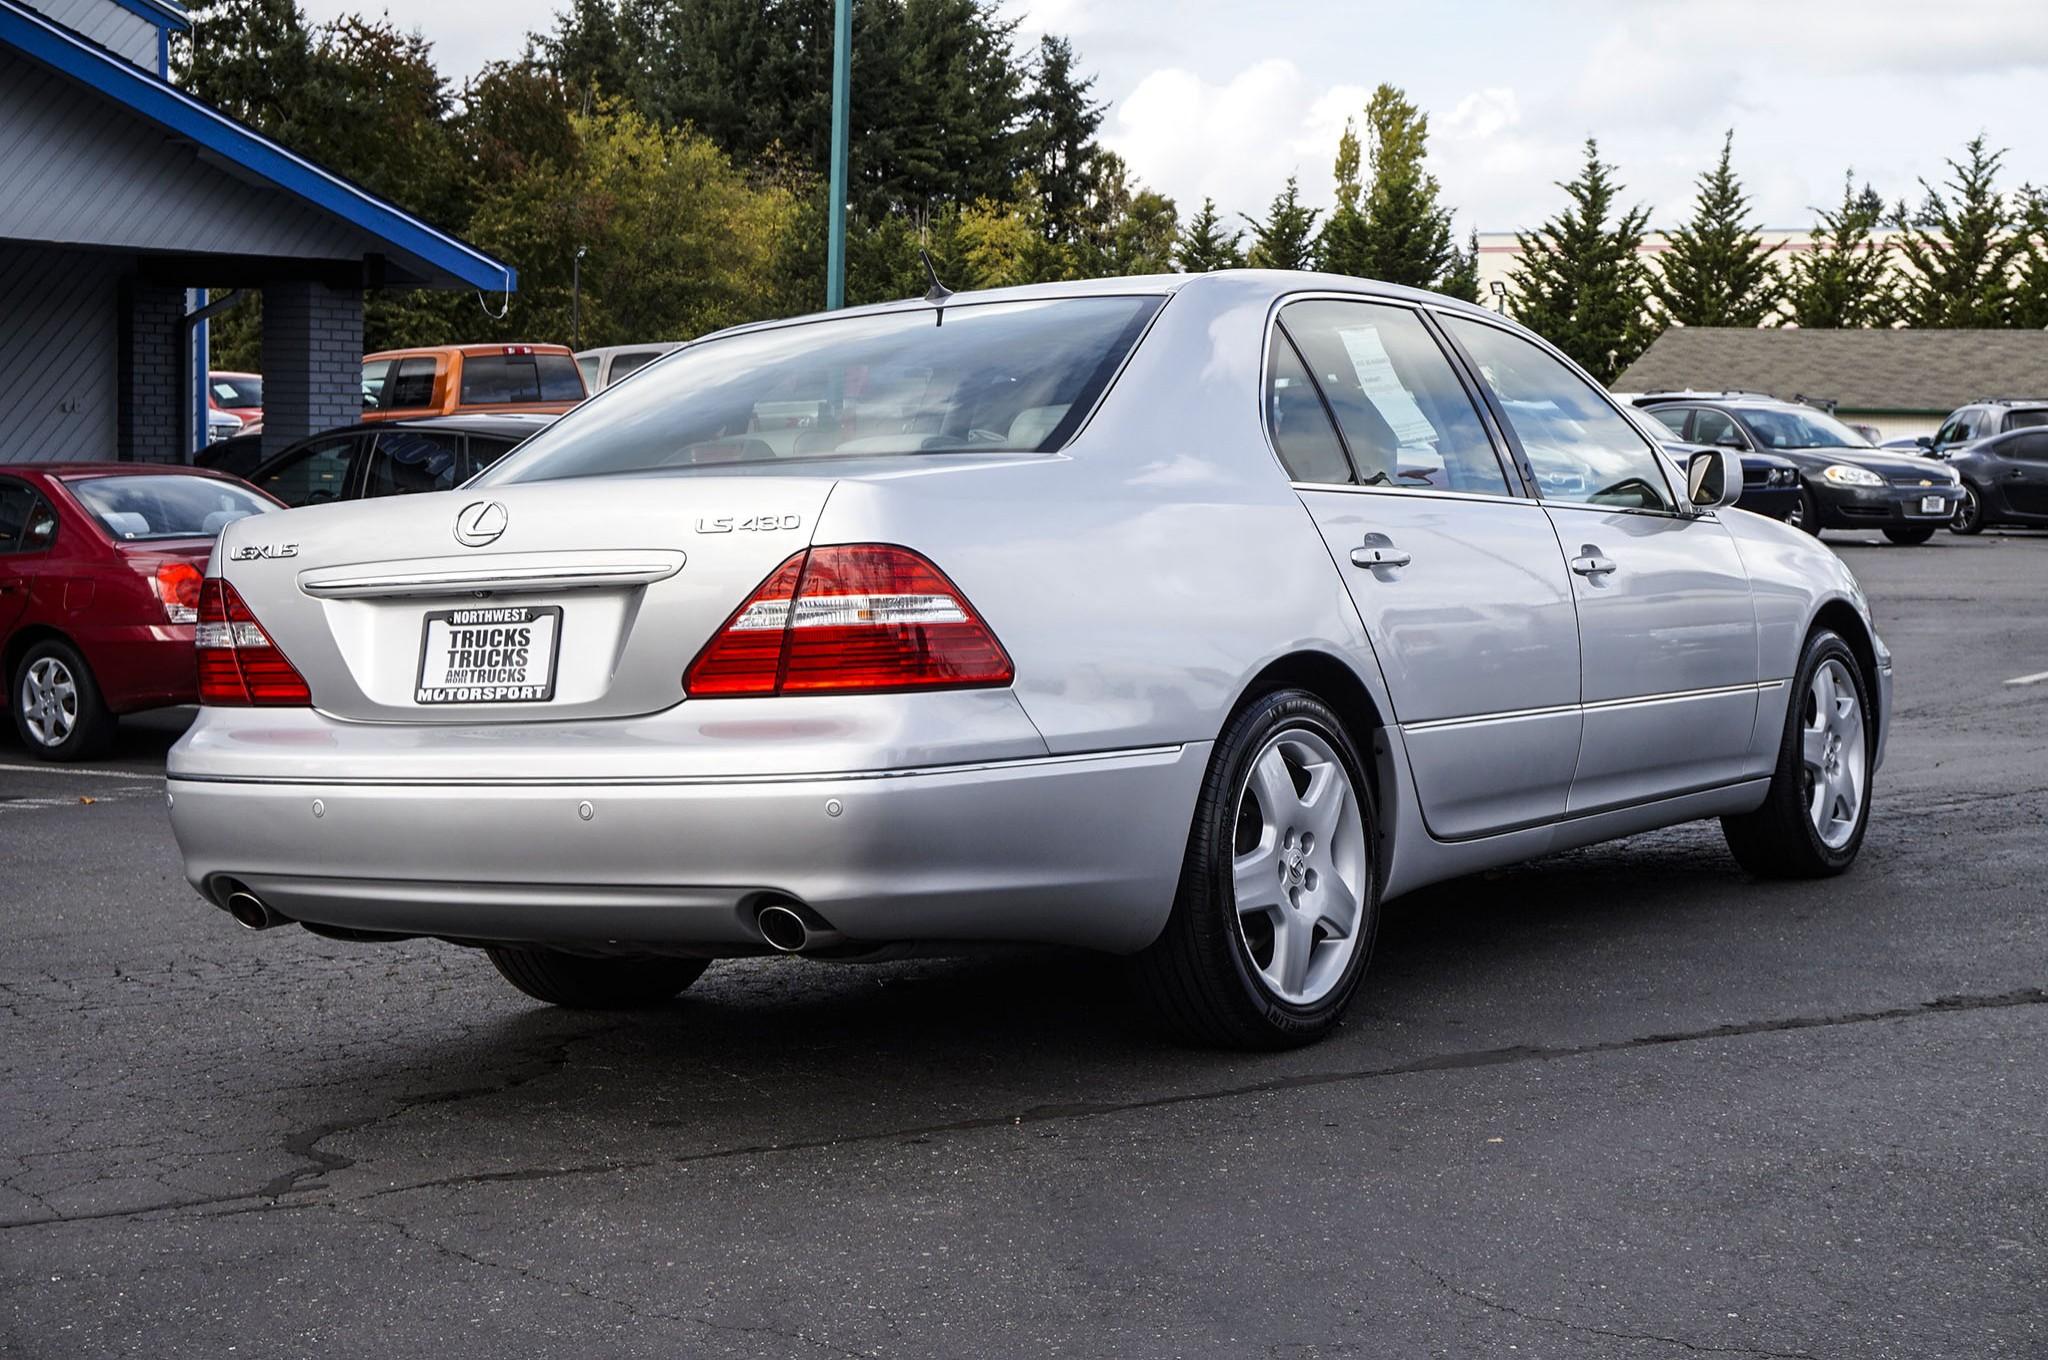 lexus auto en left online for salvaged of auctions sale copart ls lot carfinder bernardino ca black in san cert on title view